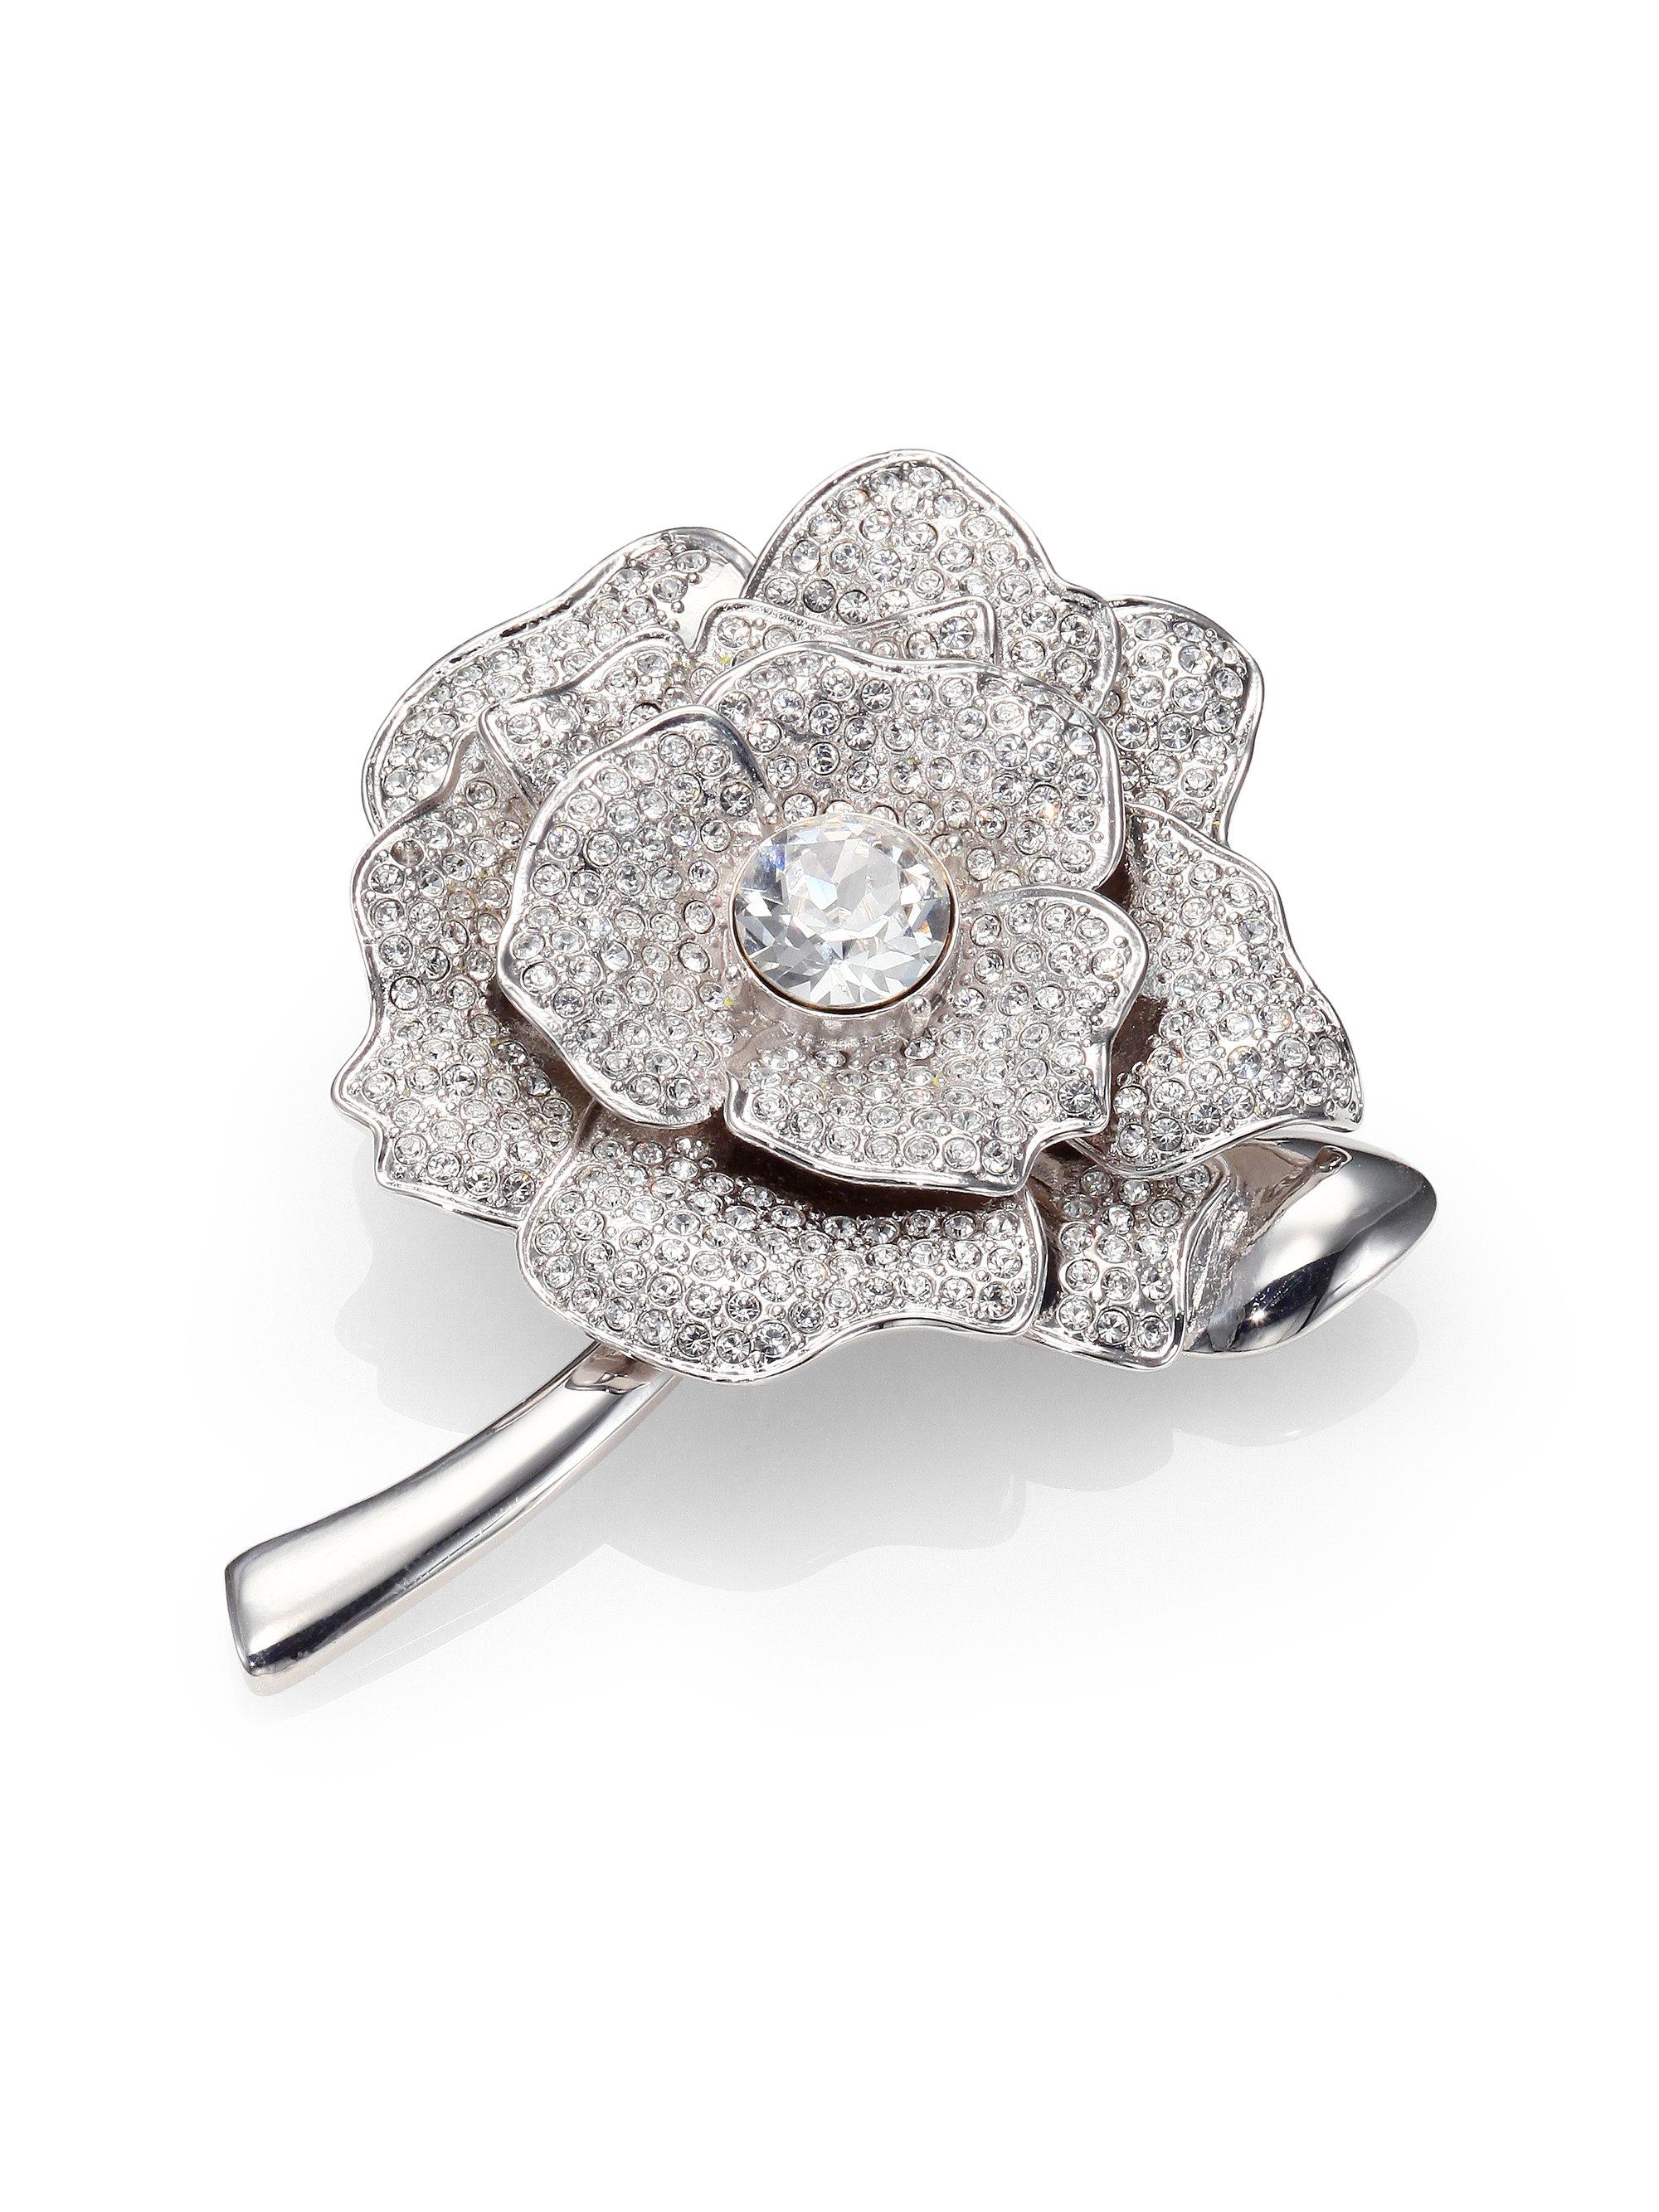 Kate Spade Rose Garden Pave Crystal Brooch In Silver